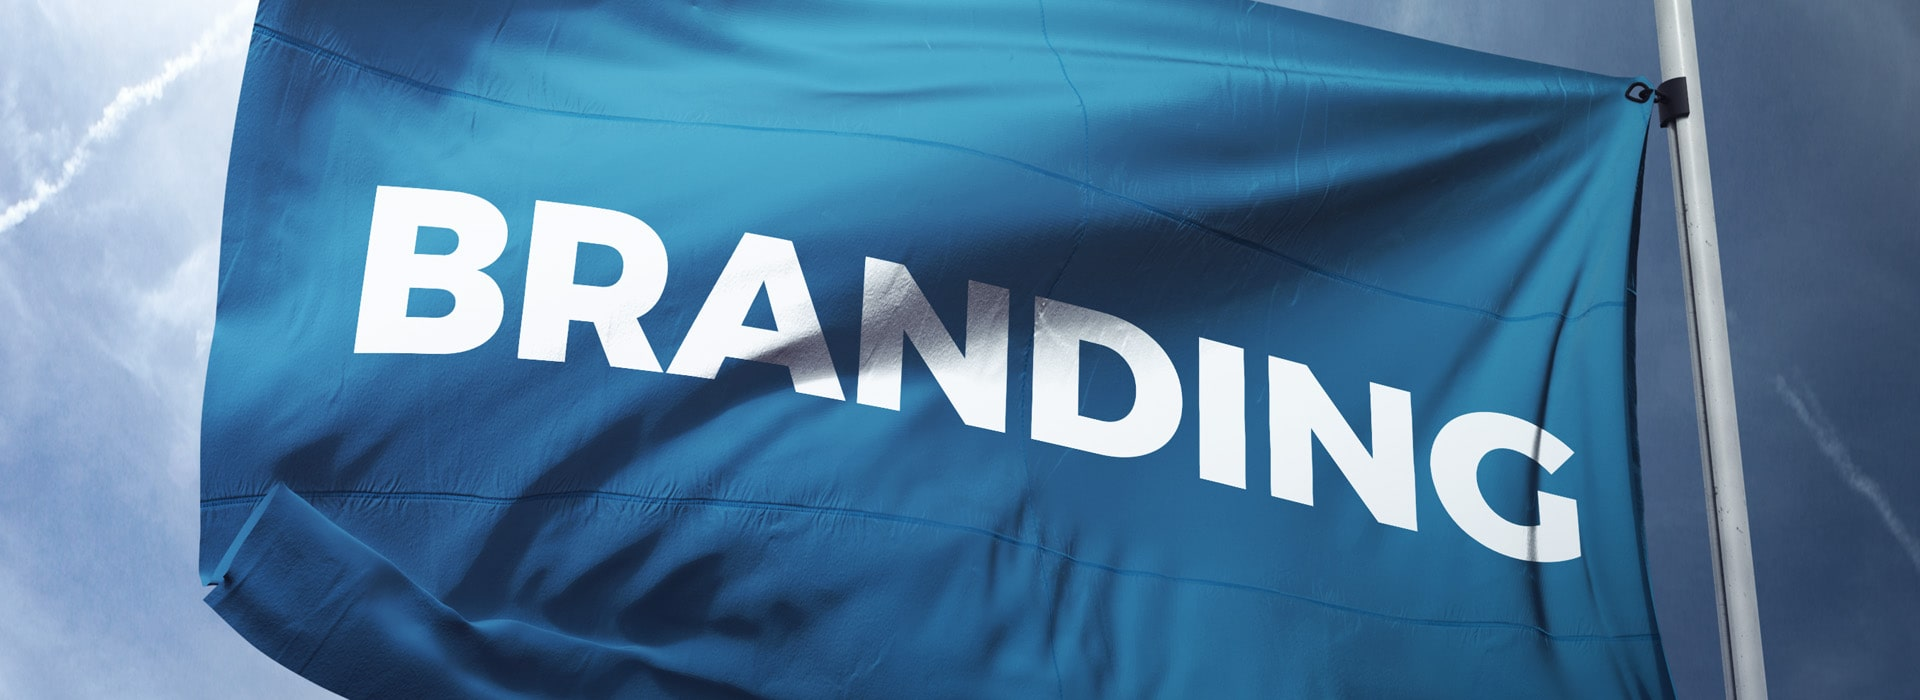 soplan-vientos-de-branding